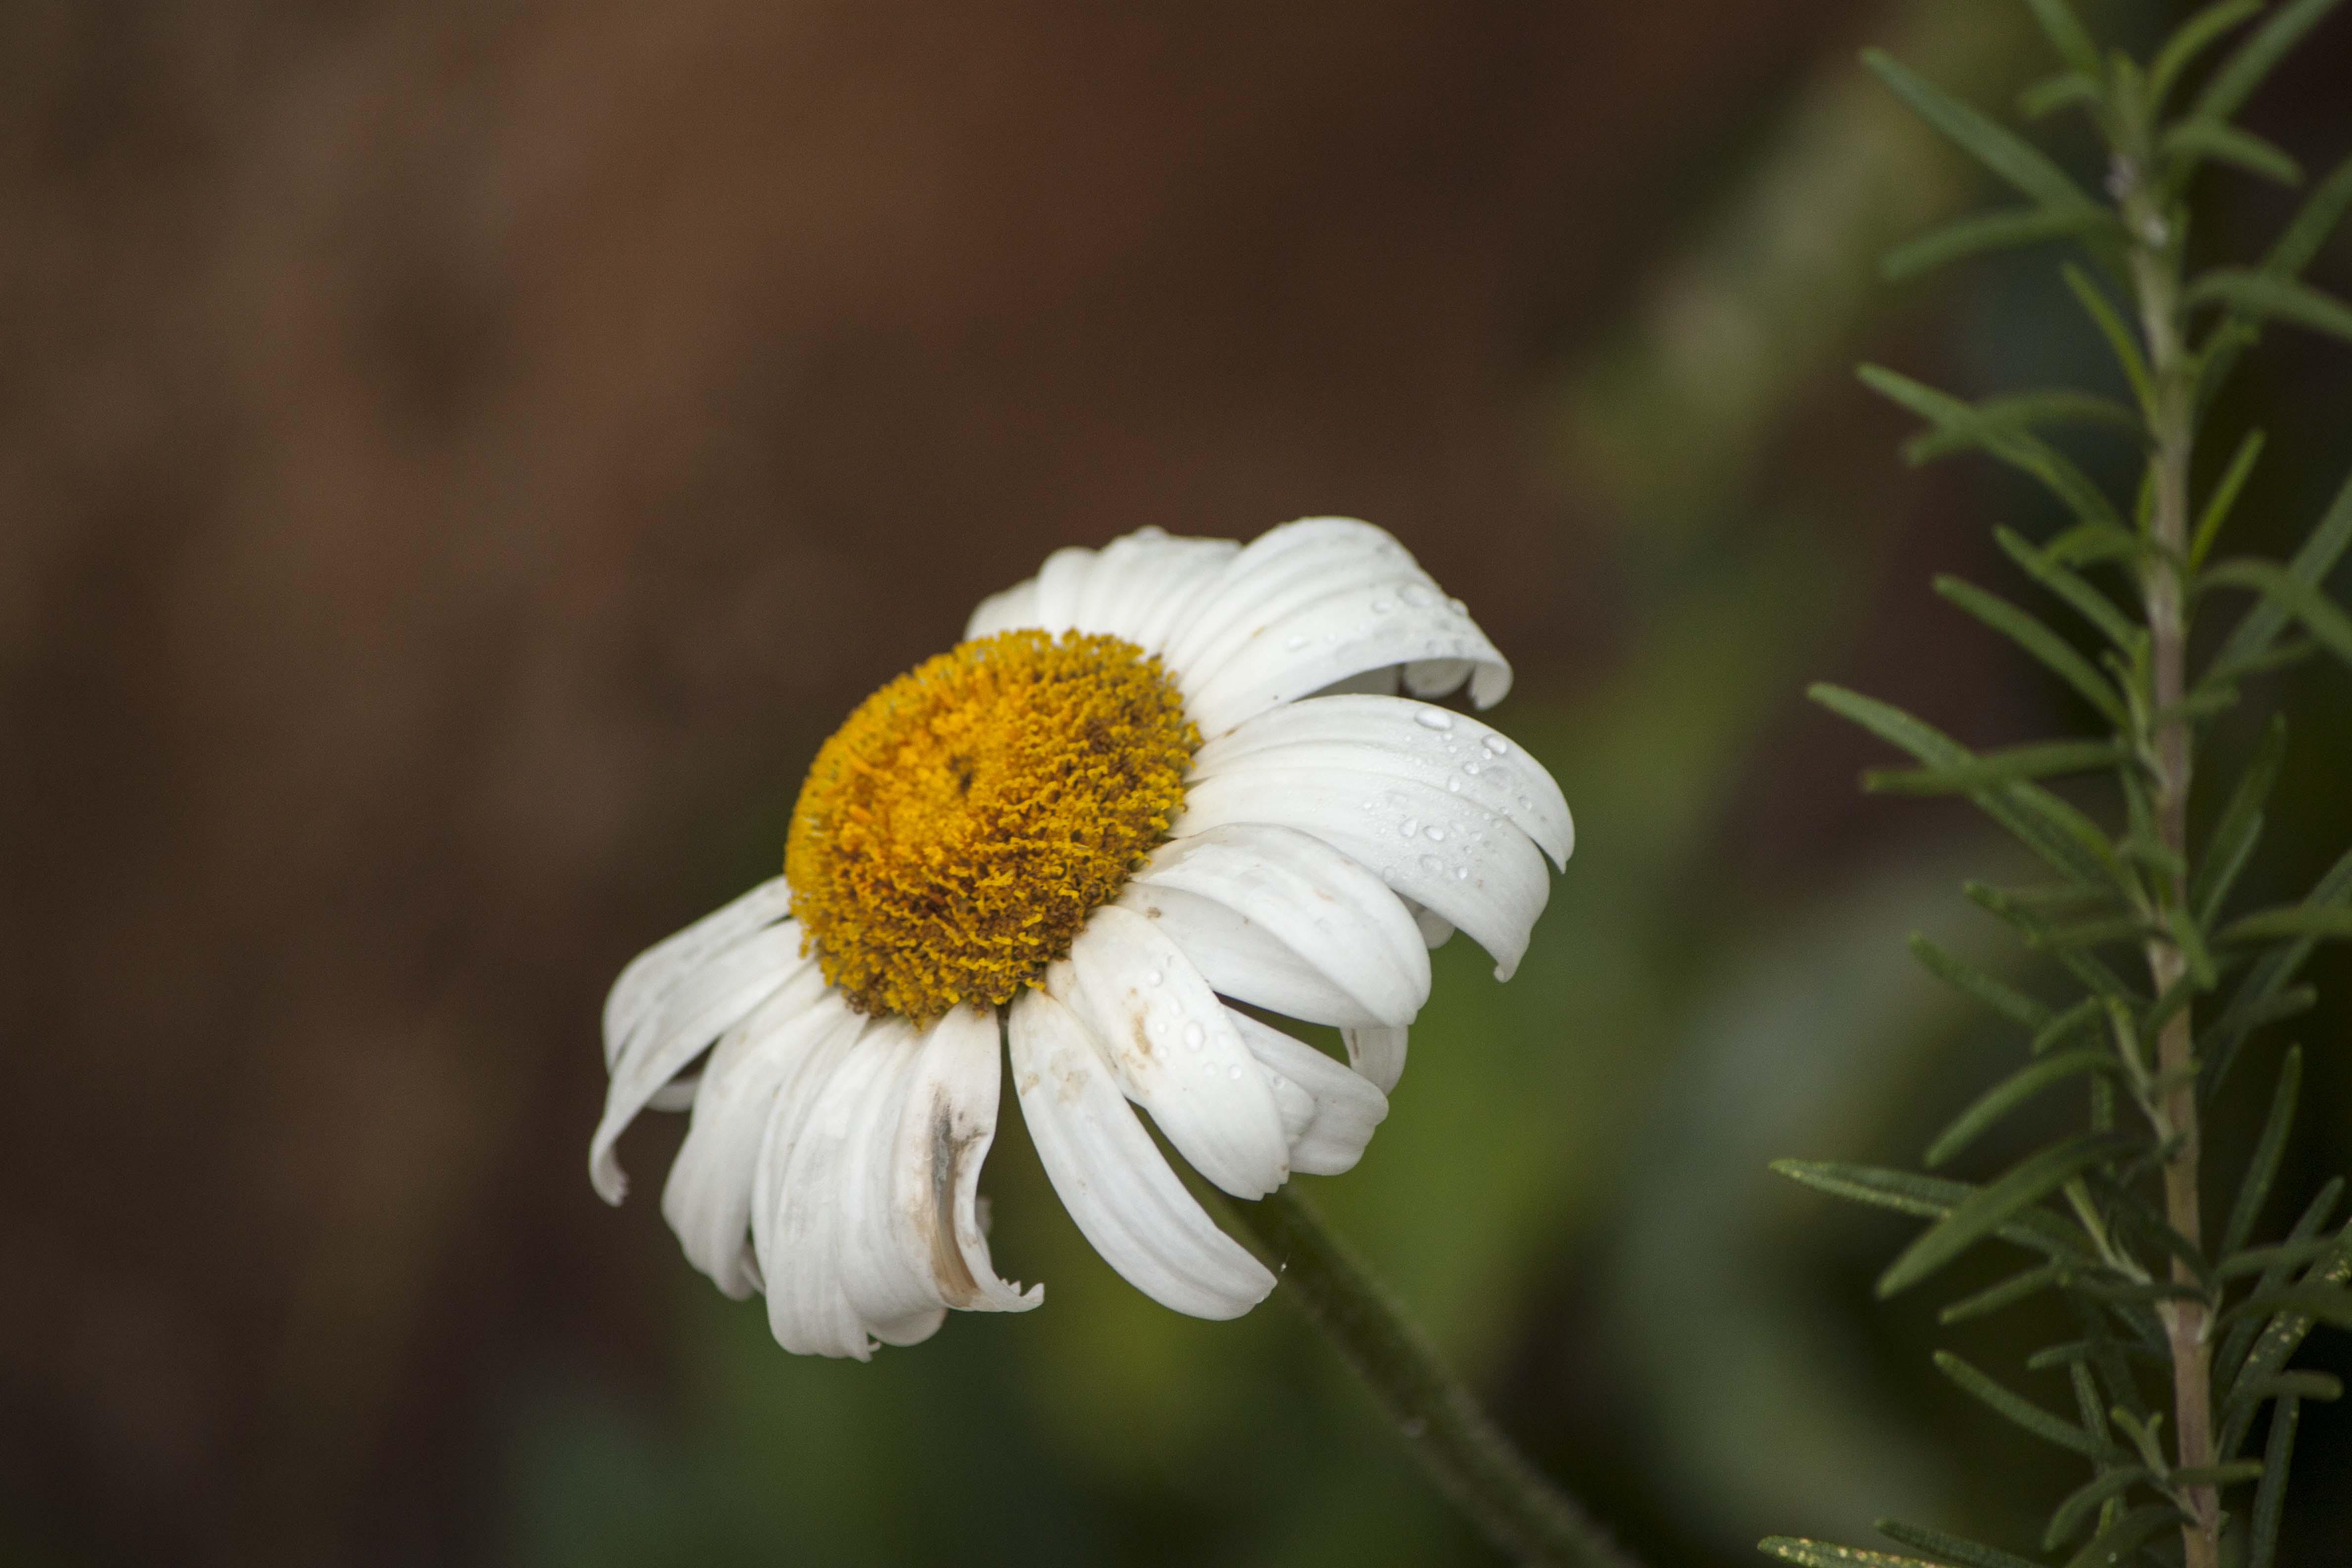 Dying Daisy, Garden, White, Summer, Spring, HQ Photo